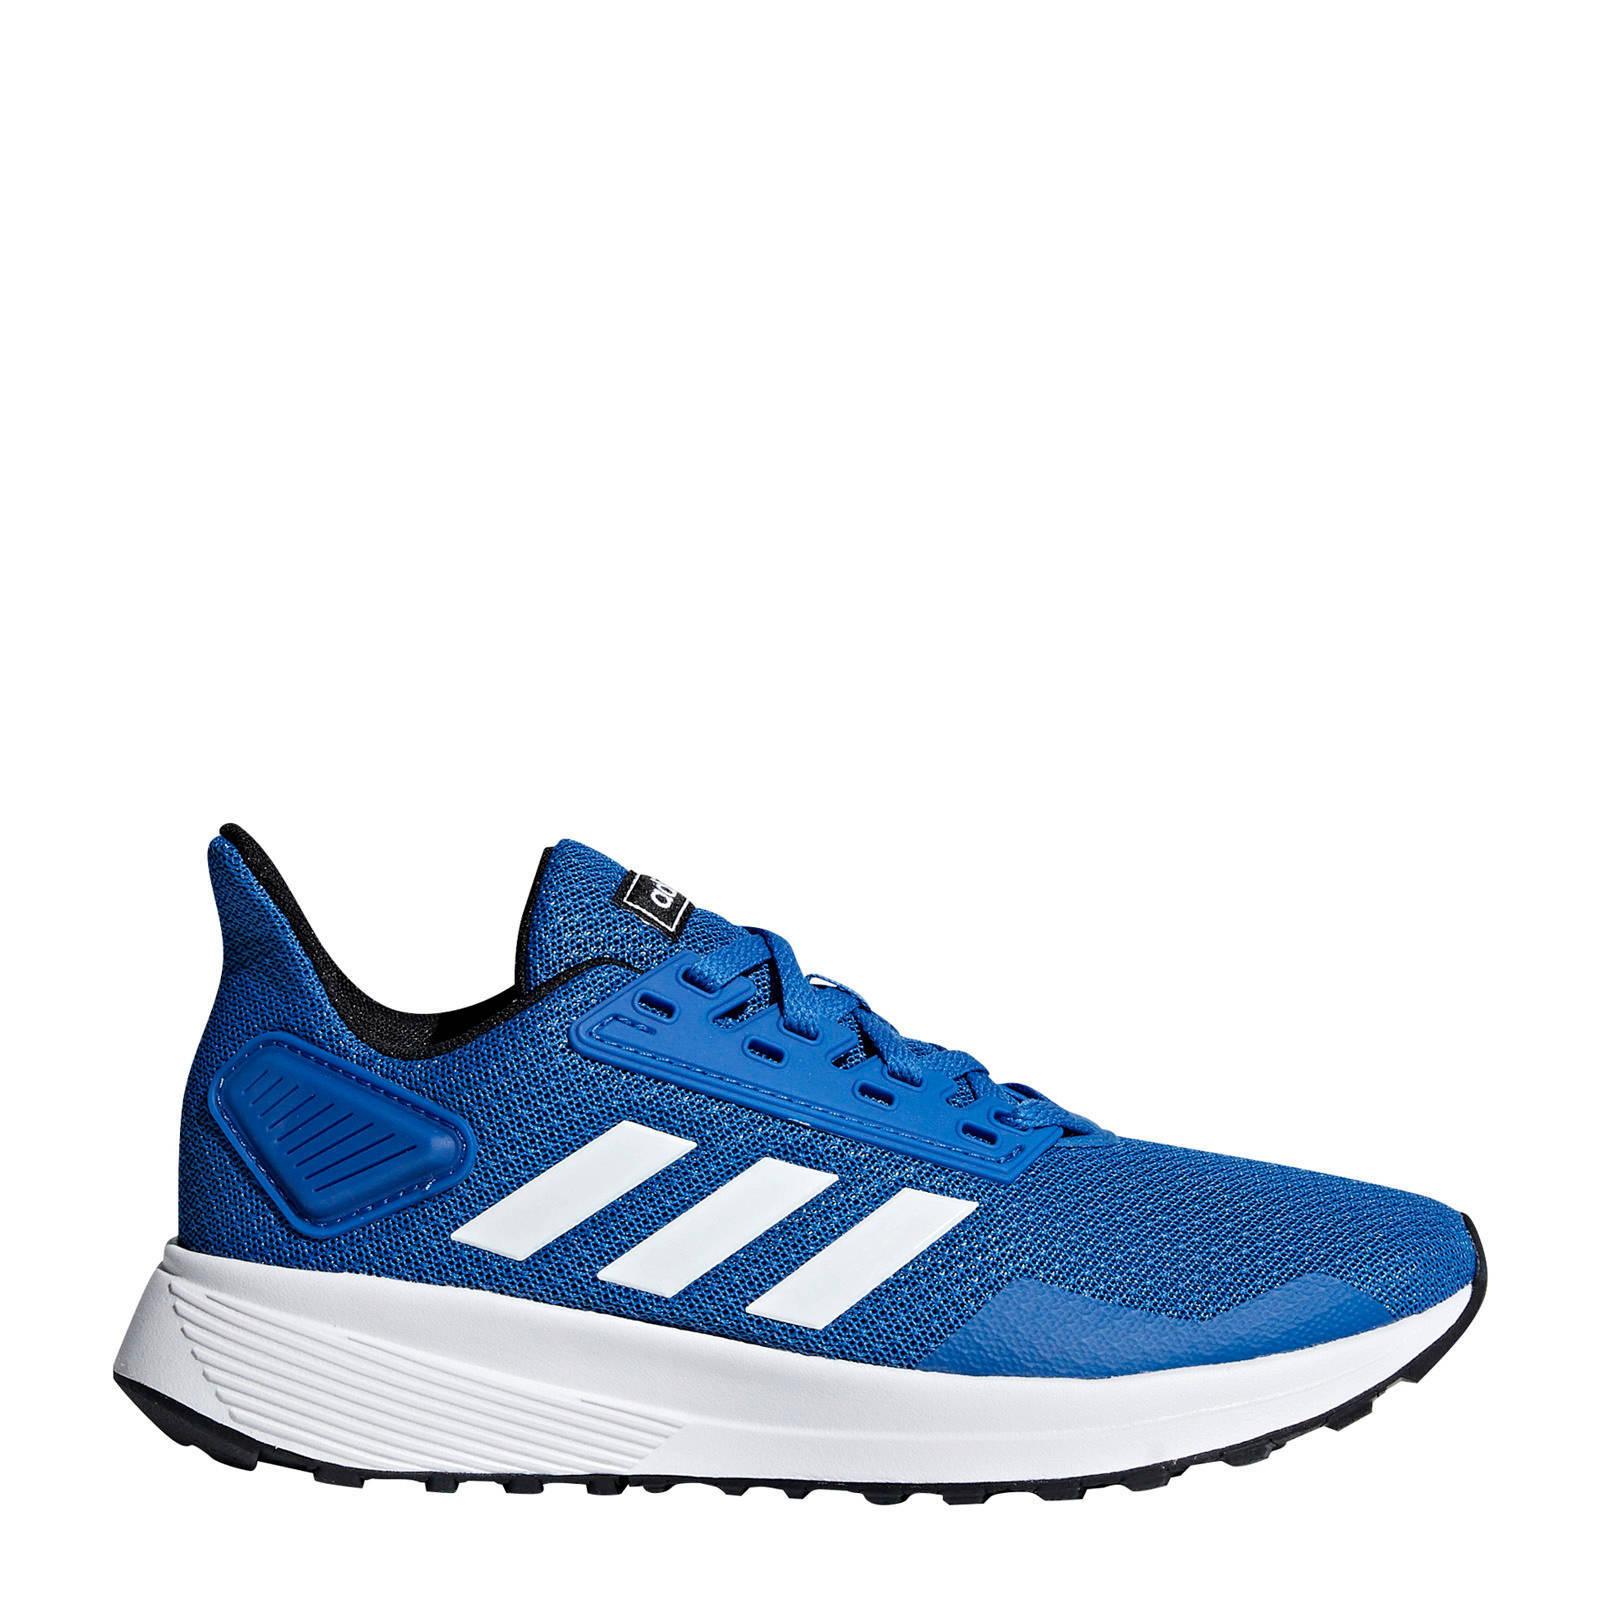 adidas Duramo 9 K hardloopschoenen blauwwit kids